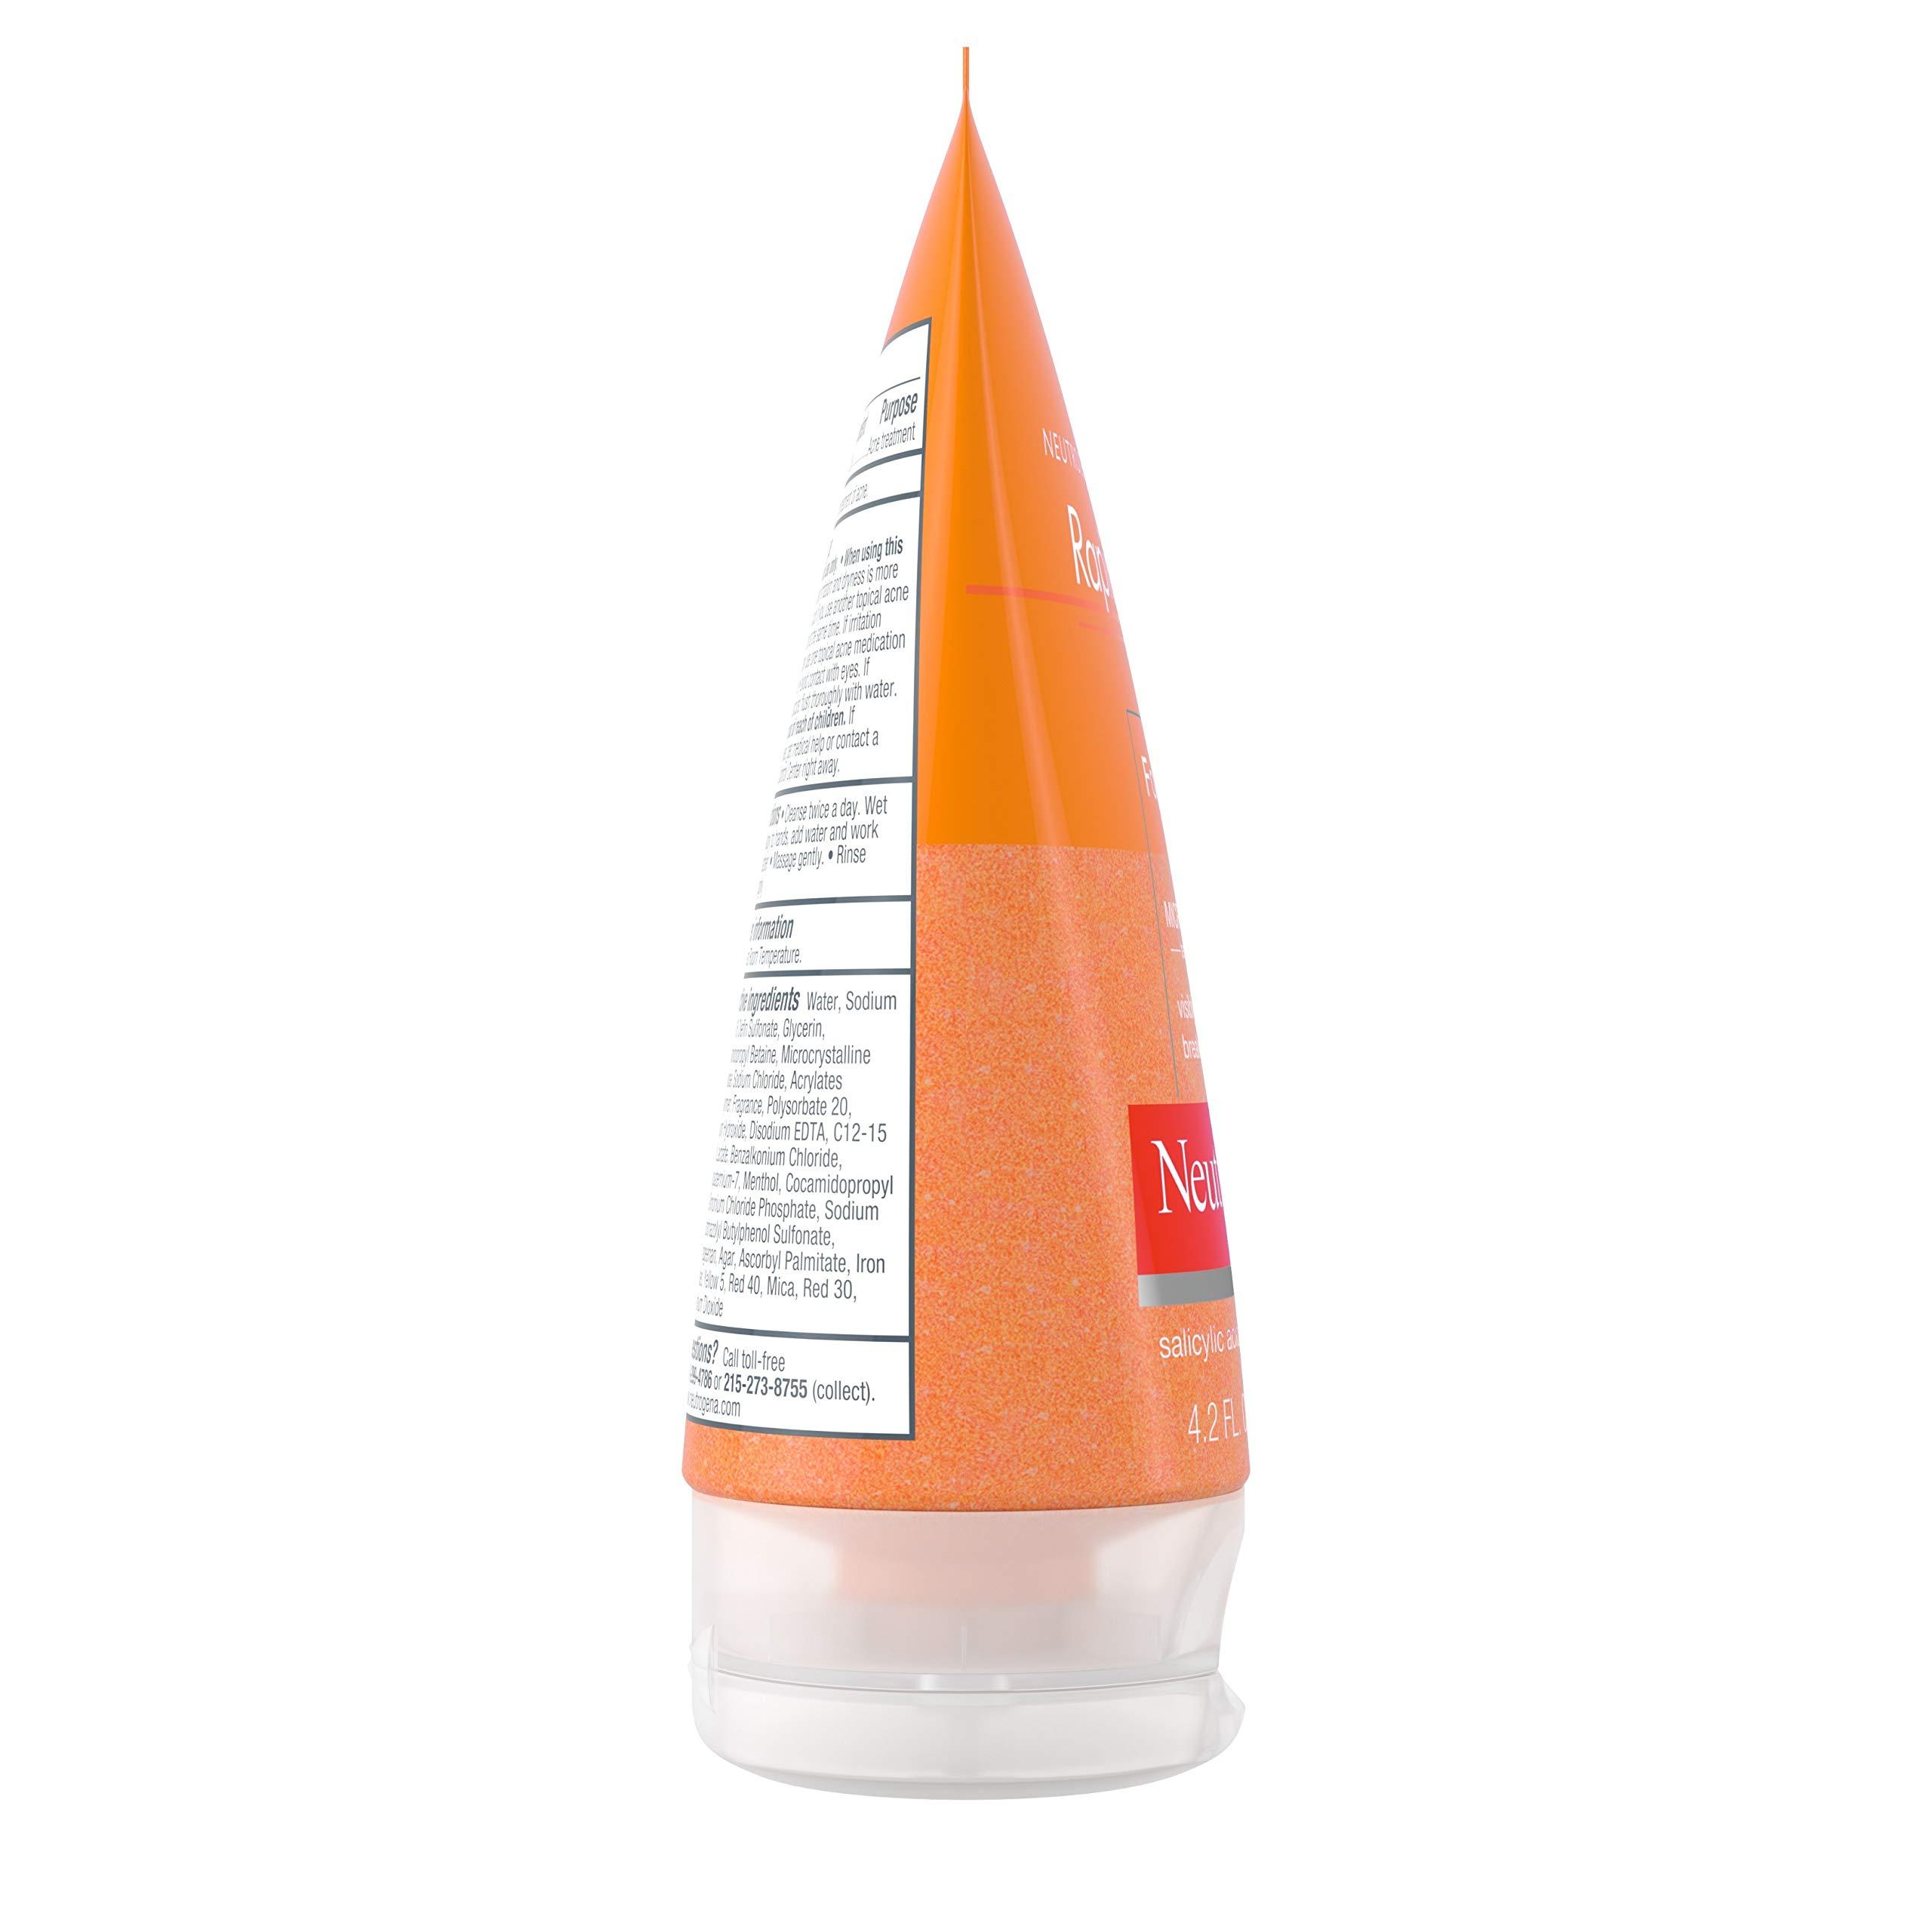 Neutrogena Rapid Clear Foaming Exfoliating Facial Scrub with Salicylic Acid Acne Medicine For Breakouts and Acne-Prone Skin, 4.2 fl. oz